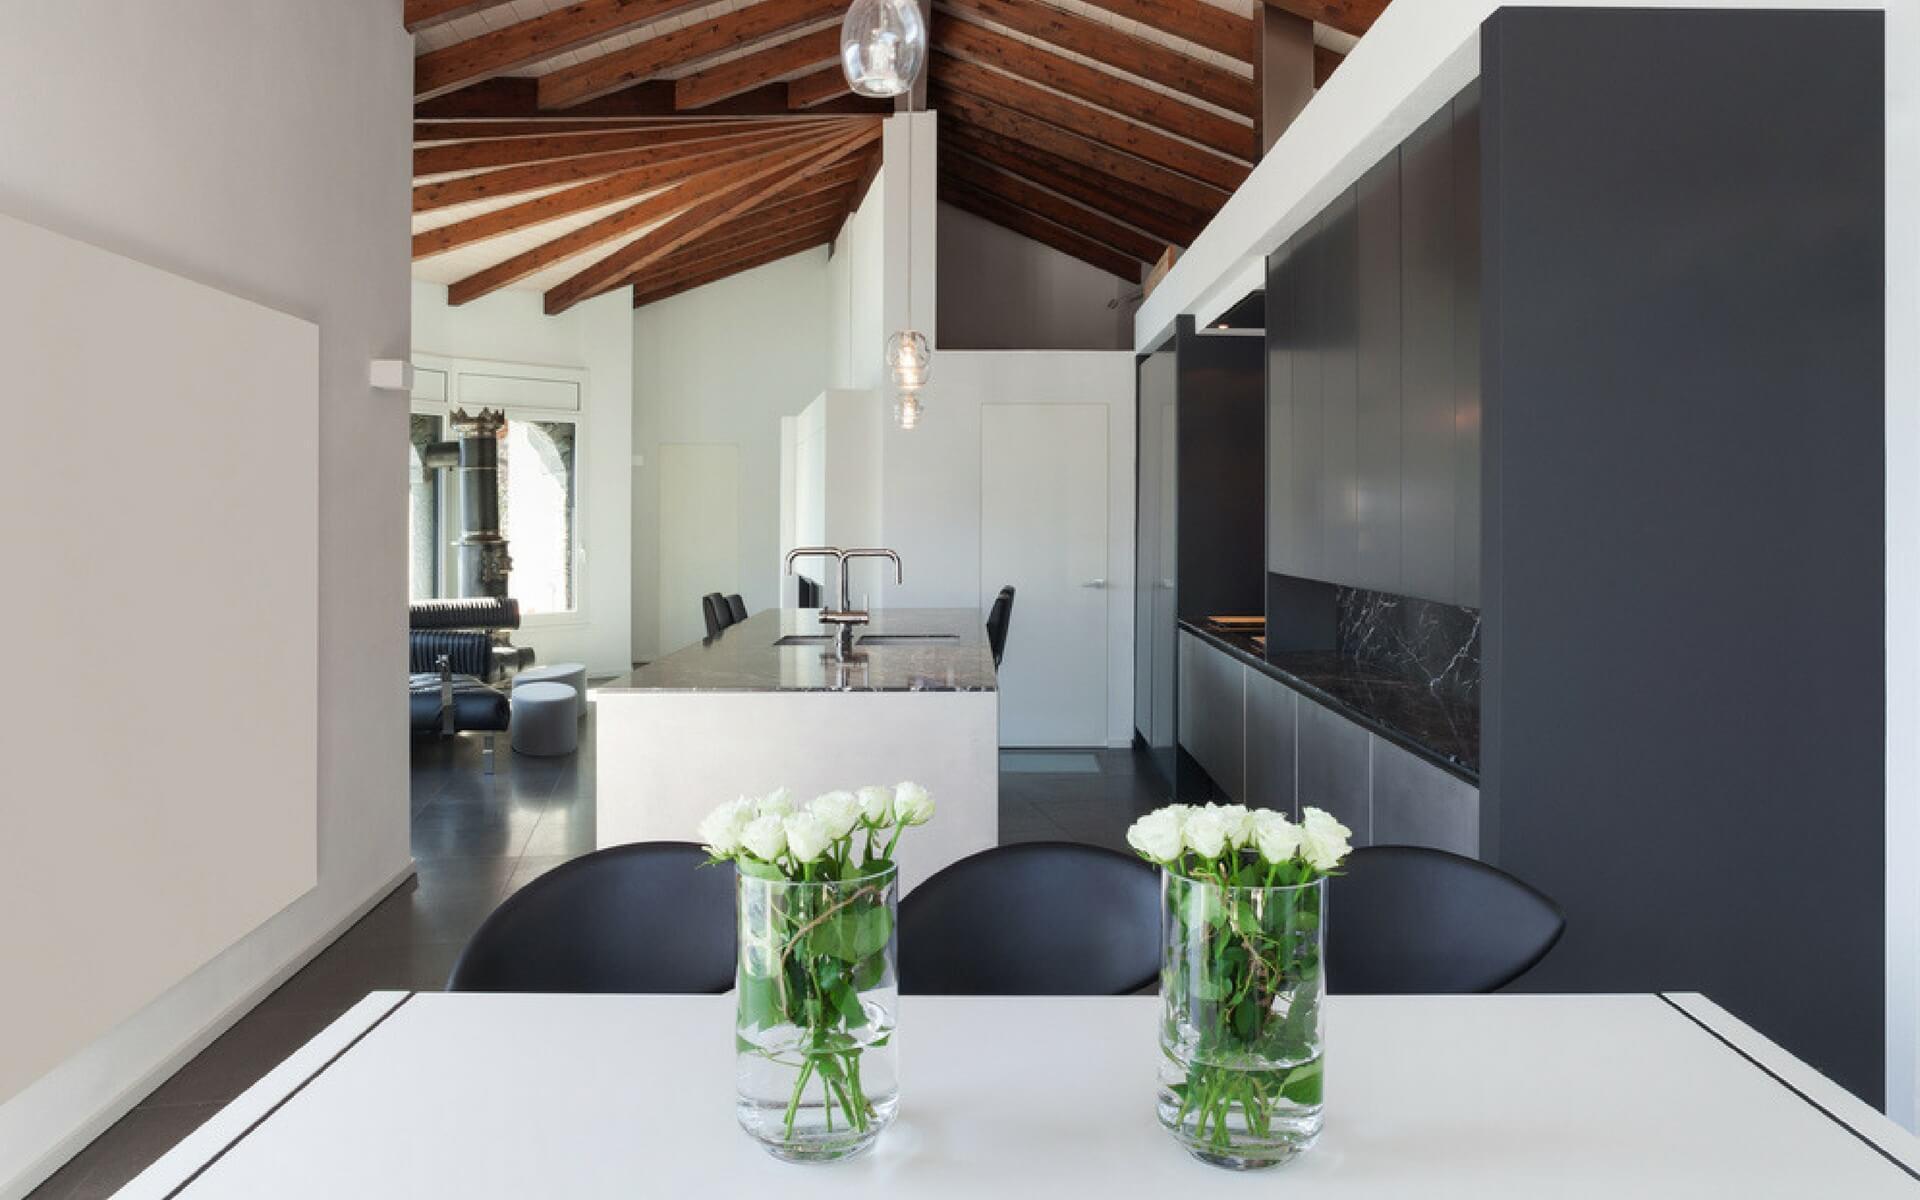 Un attico open space nelle alpi svizzere blog oknoplast - Open space casa ...